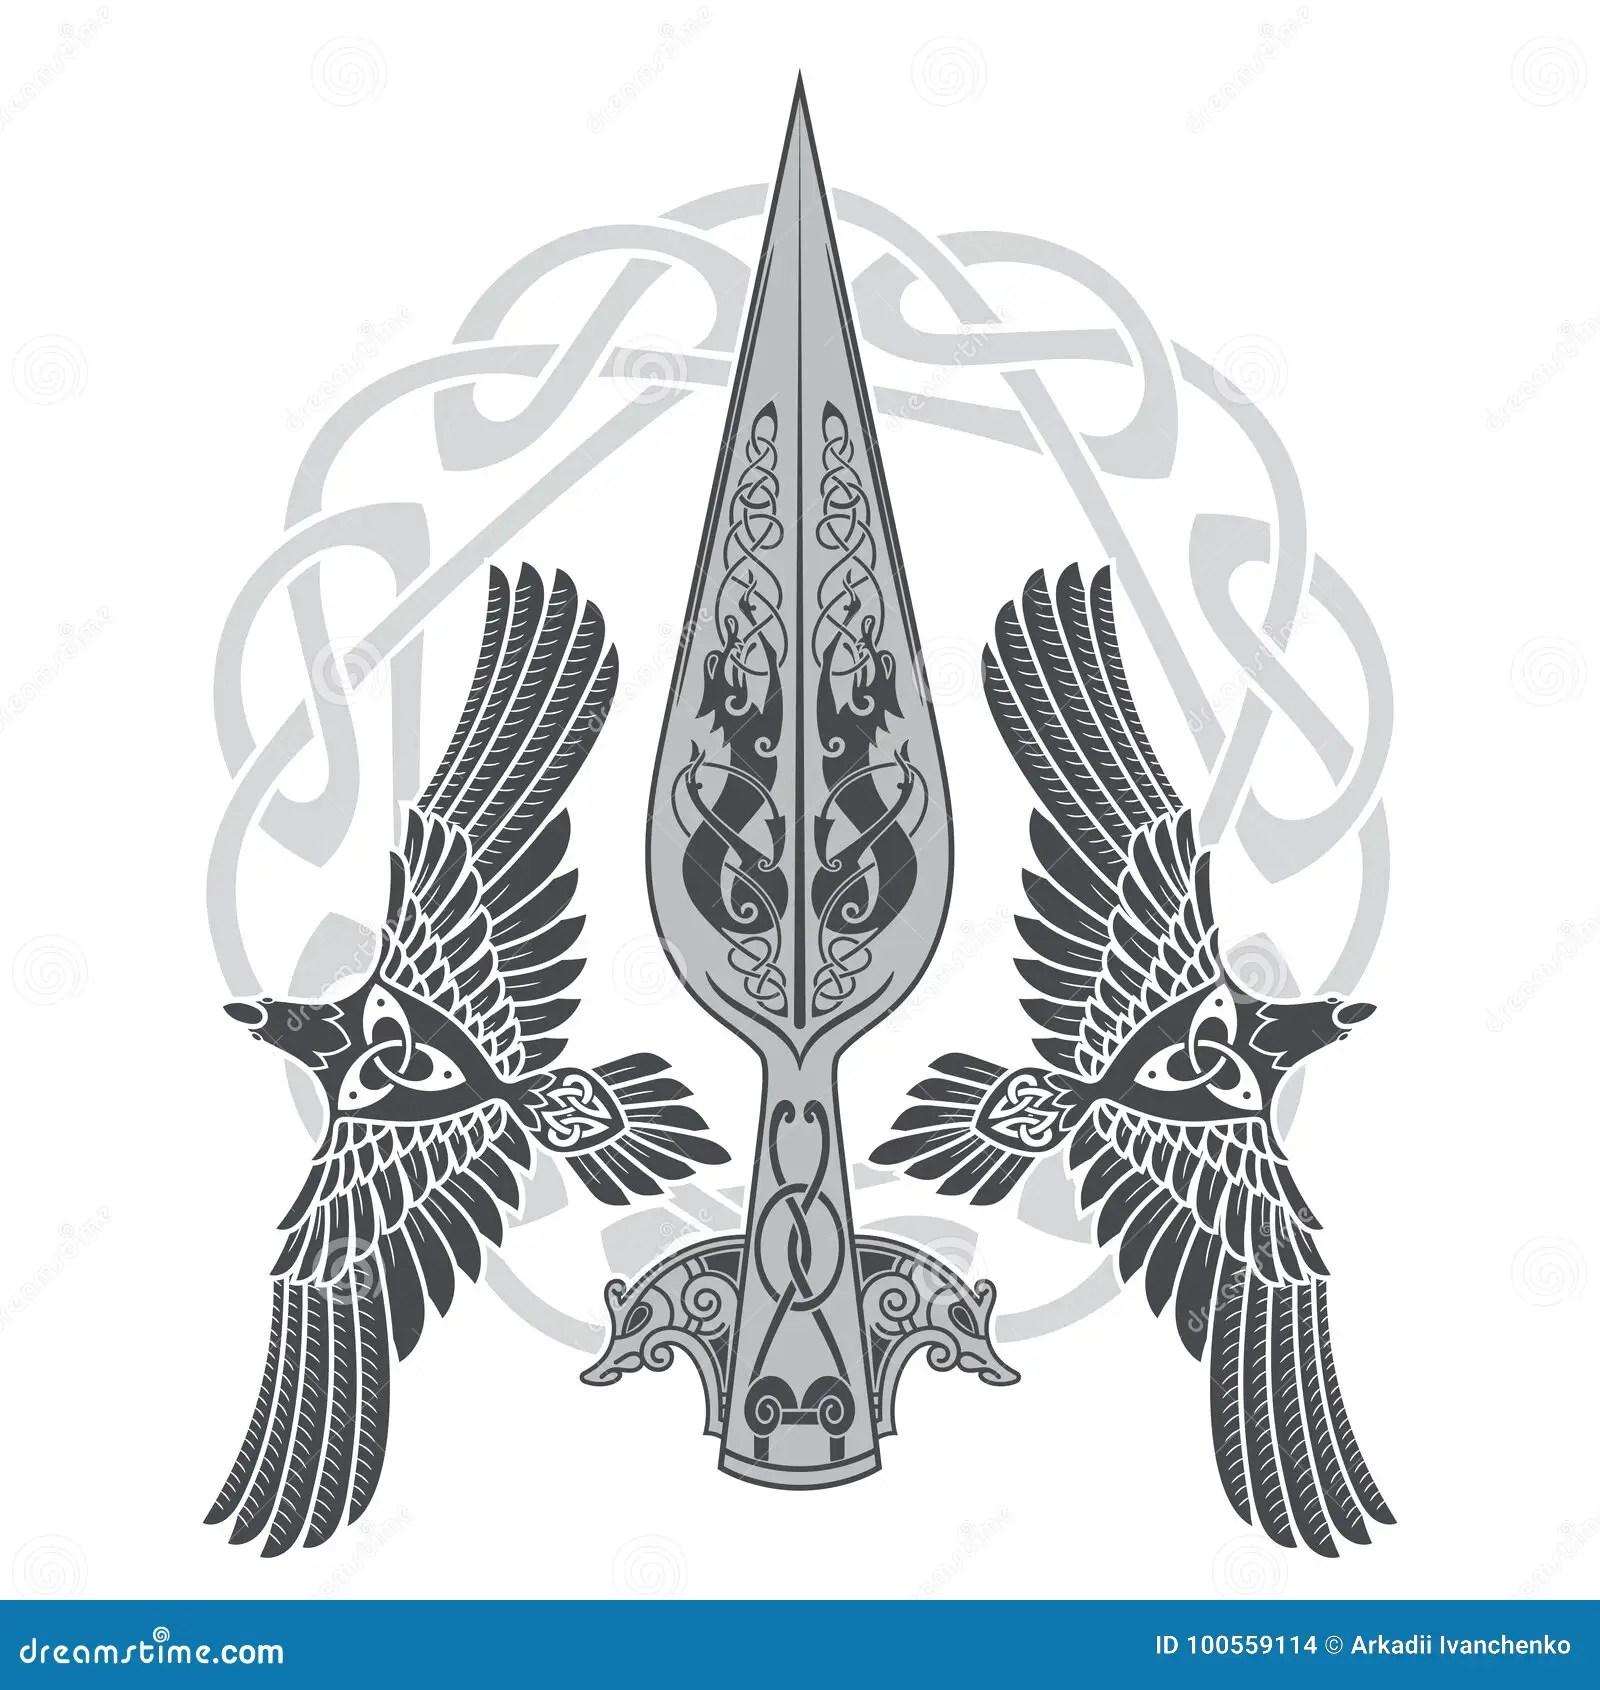 Odin Stock Illustrationen, Vektors, & Klipart